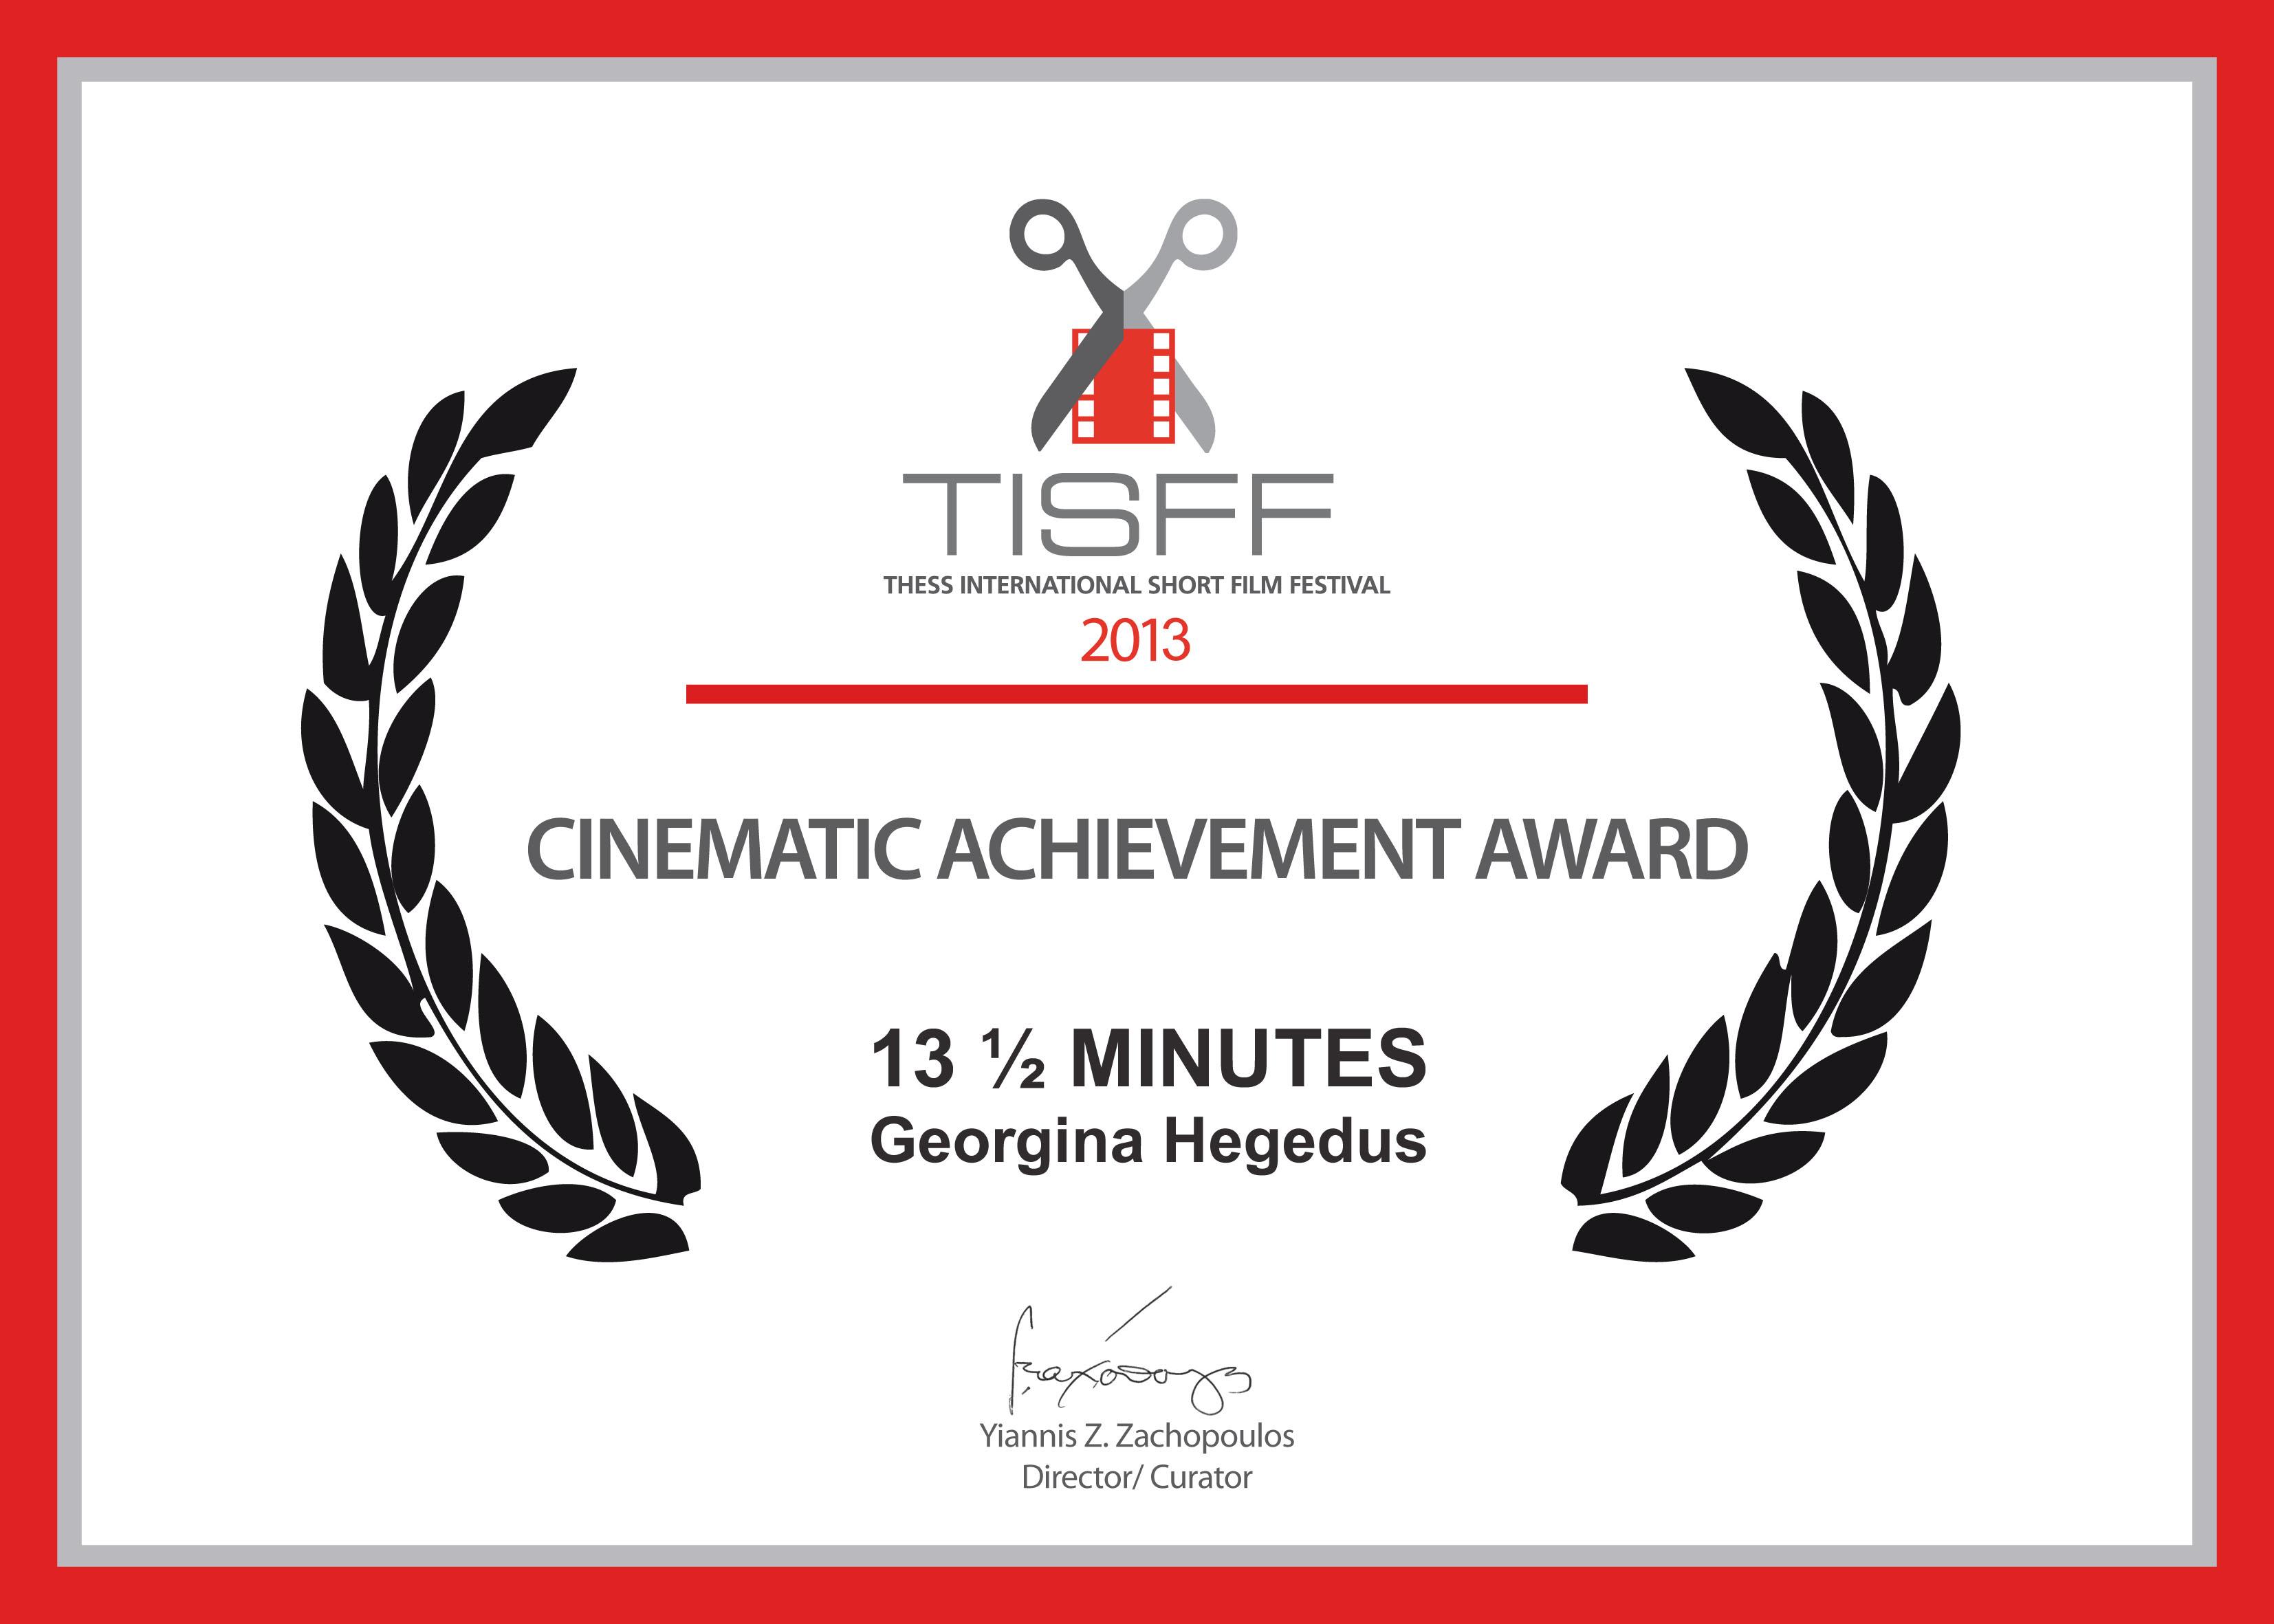 tissf_awards_2013_17_Geor gina Hegedus ů_ý___ůş_